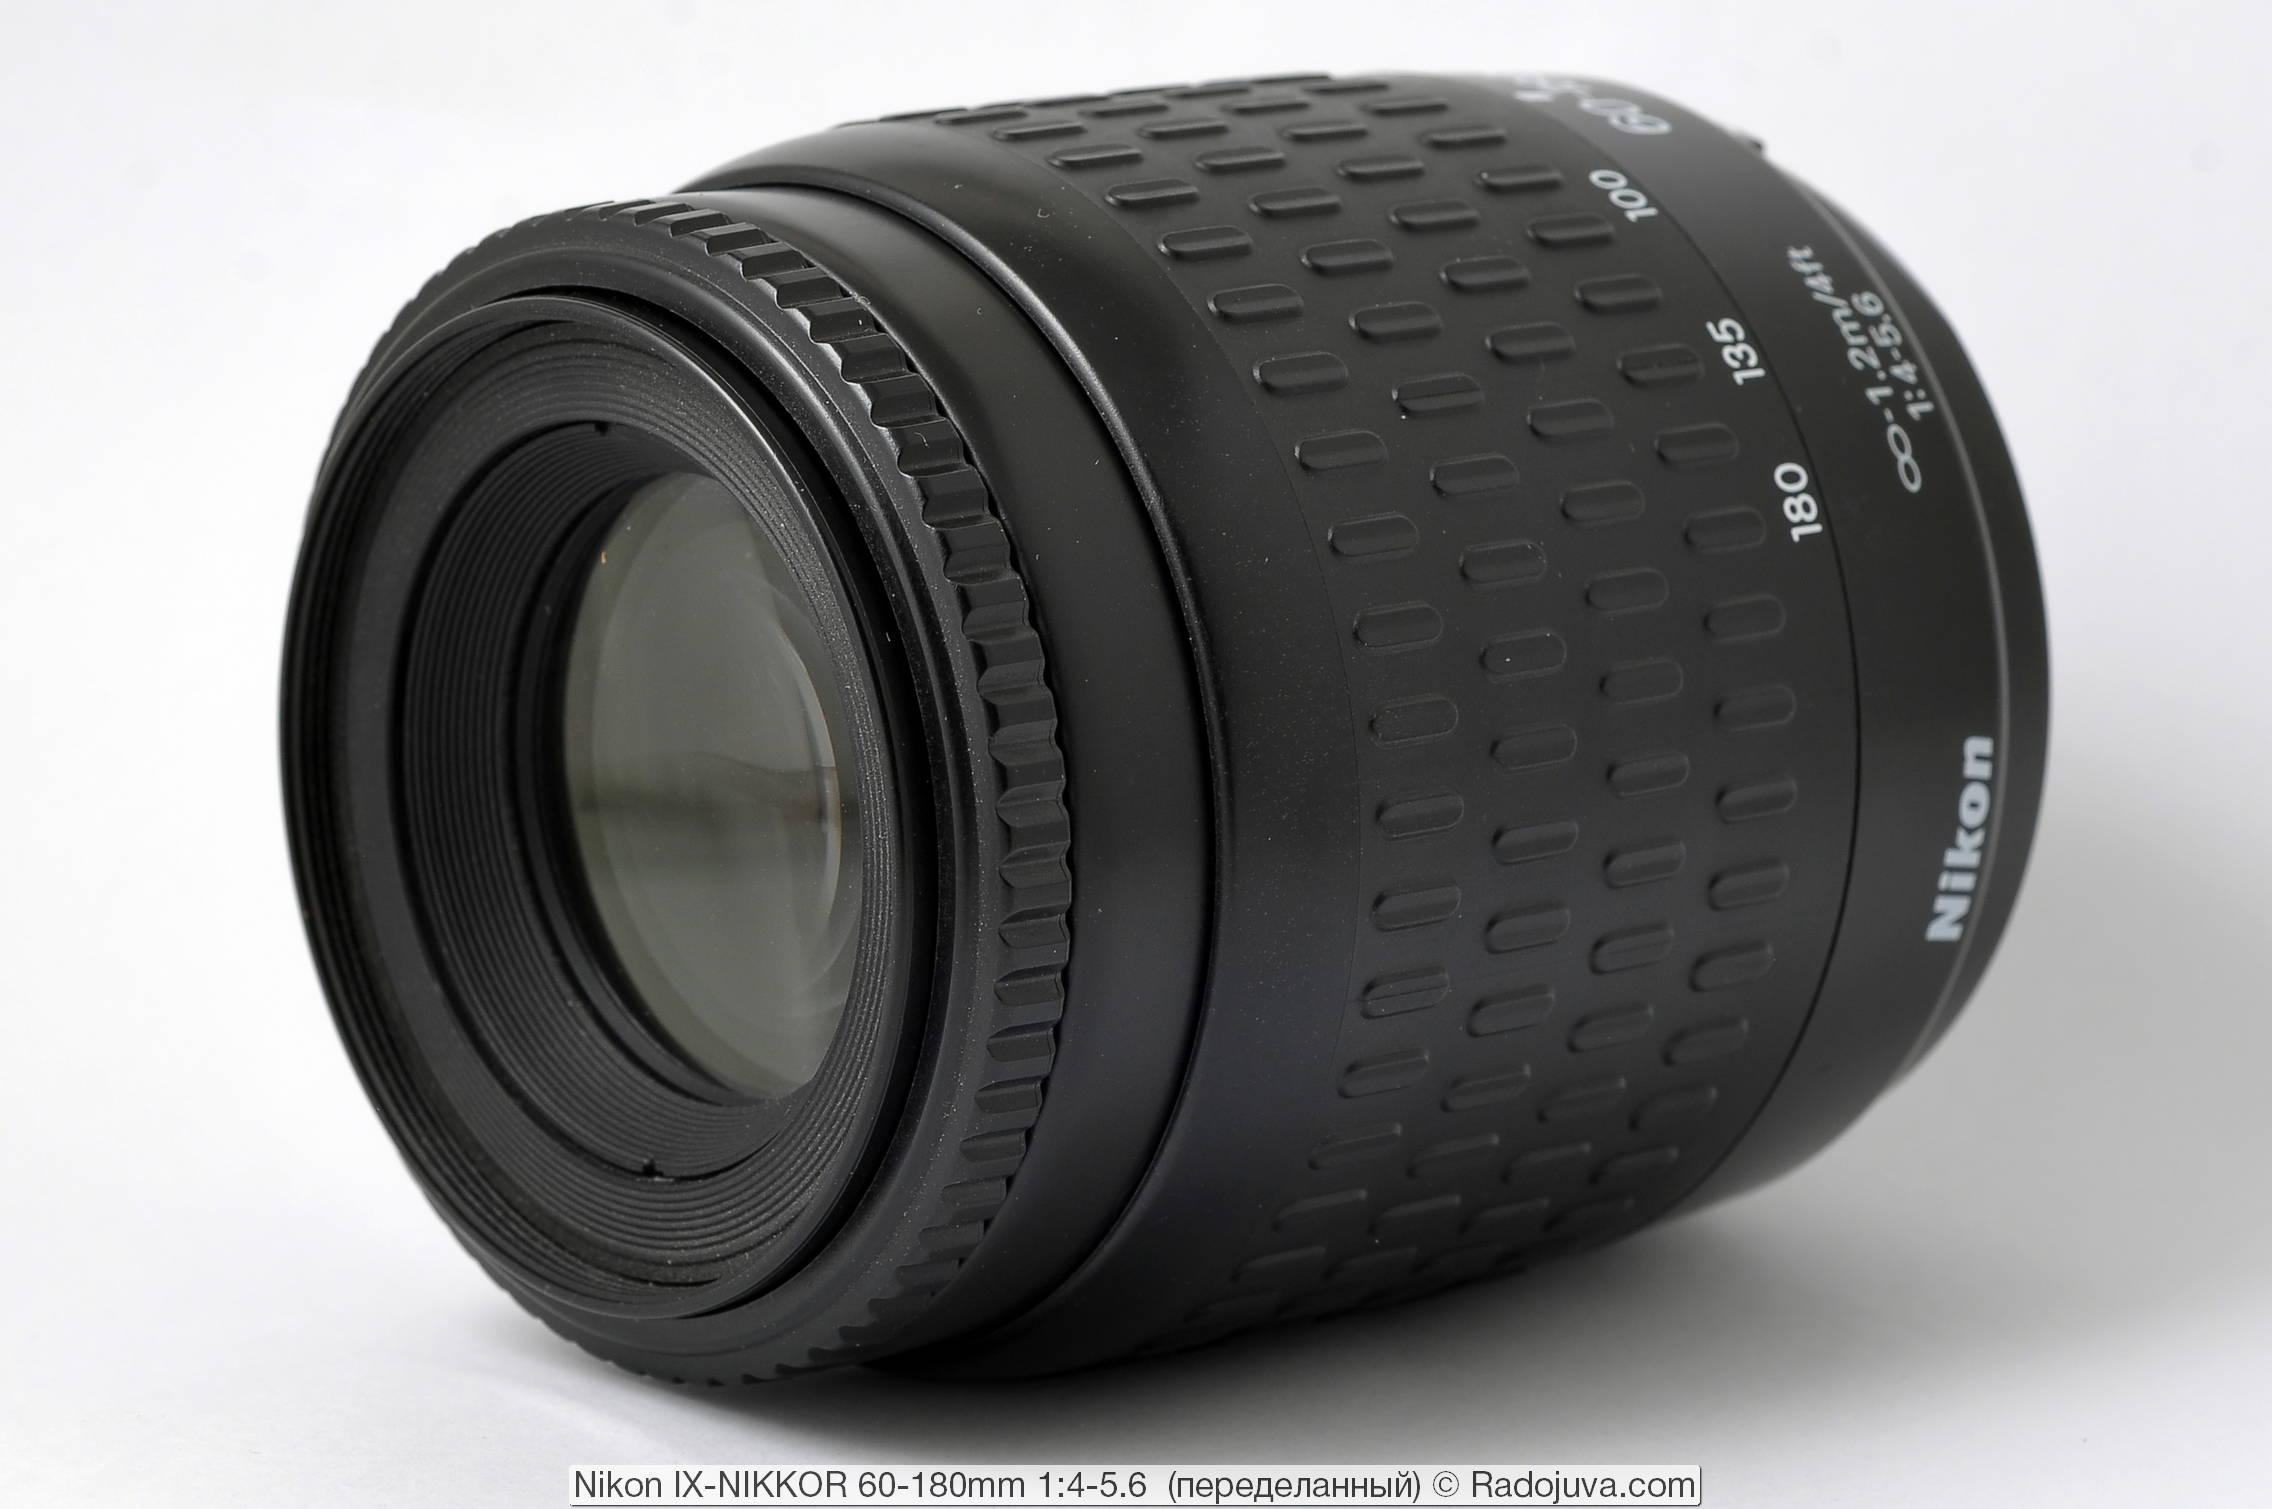 Nikon IX-NIKKOR 60-180mm 1:4-5.6